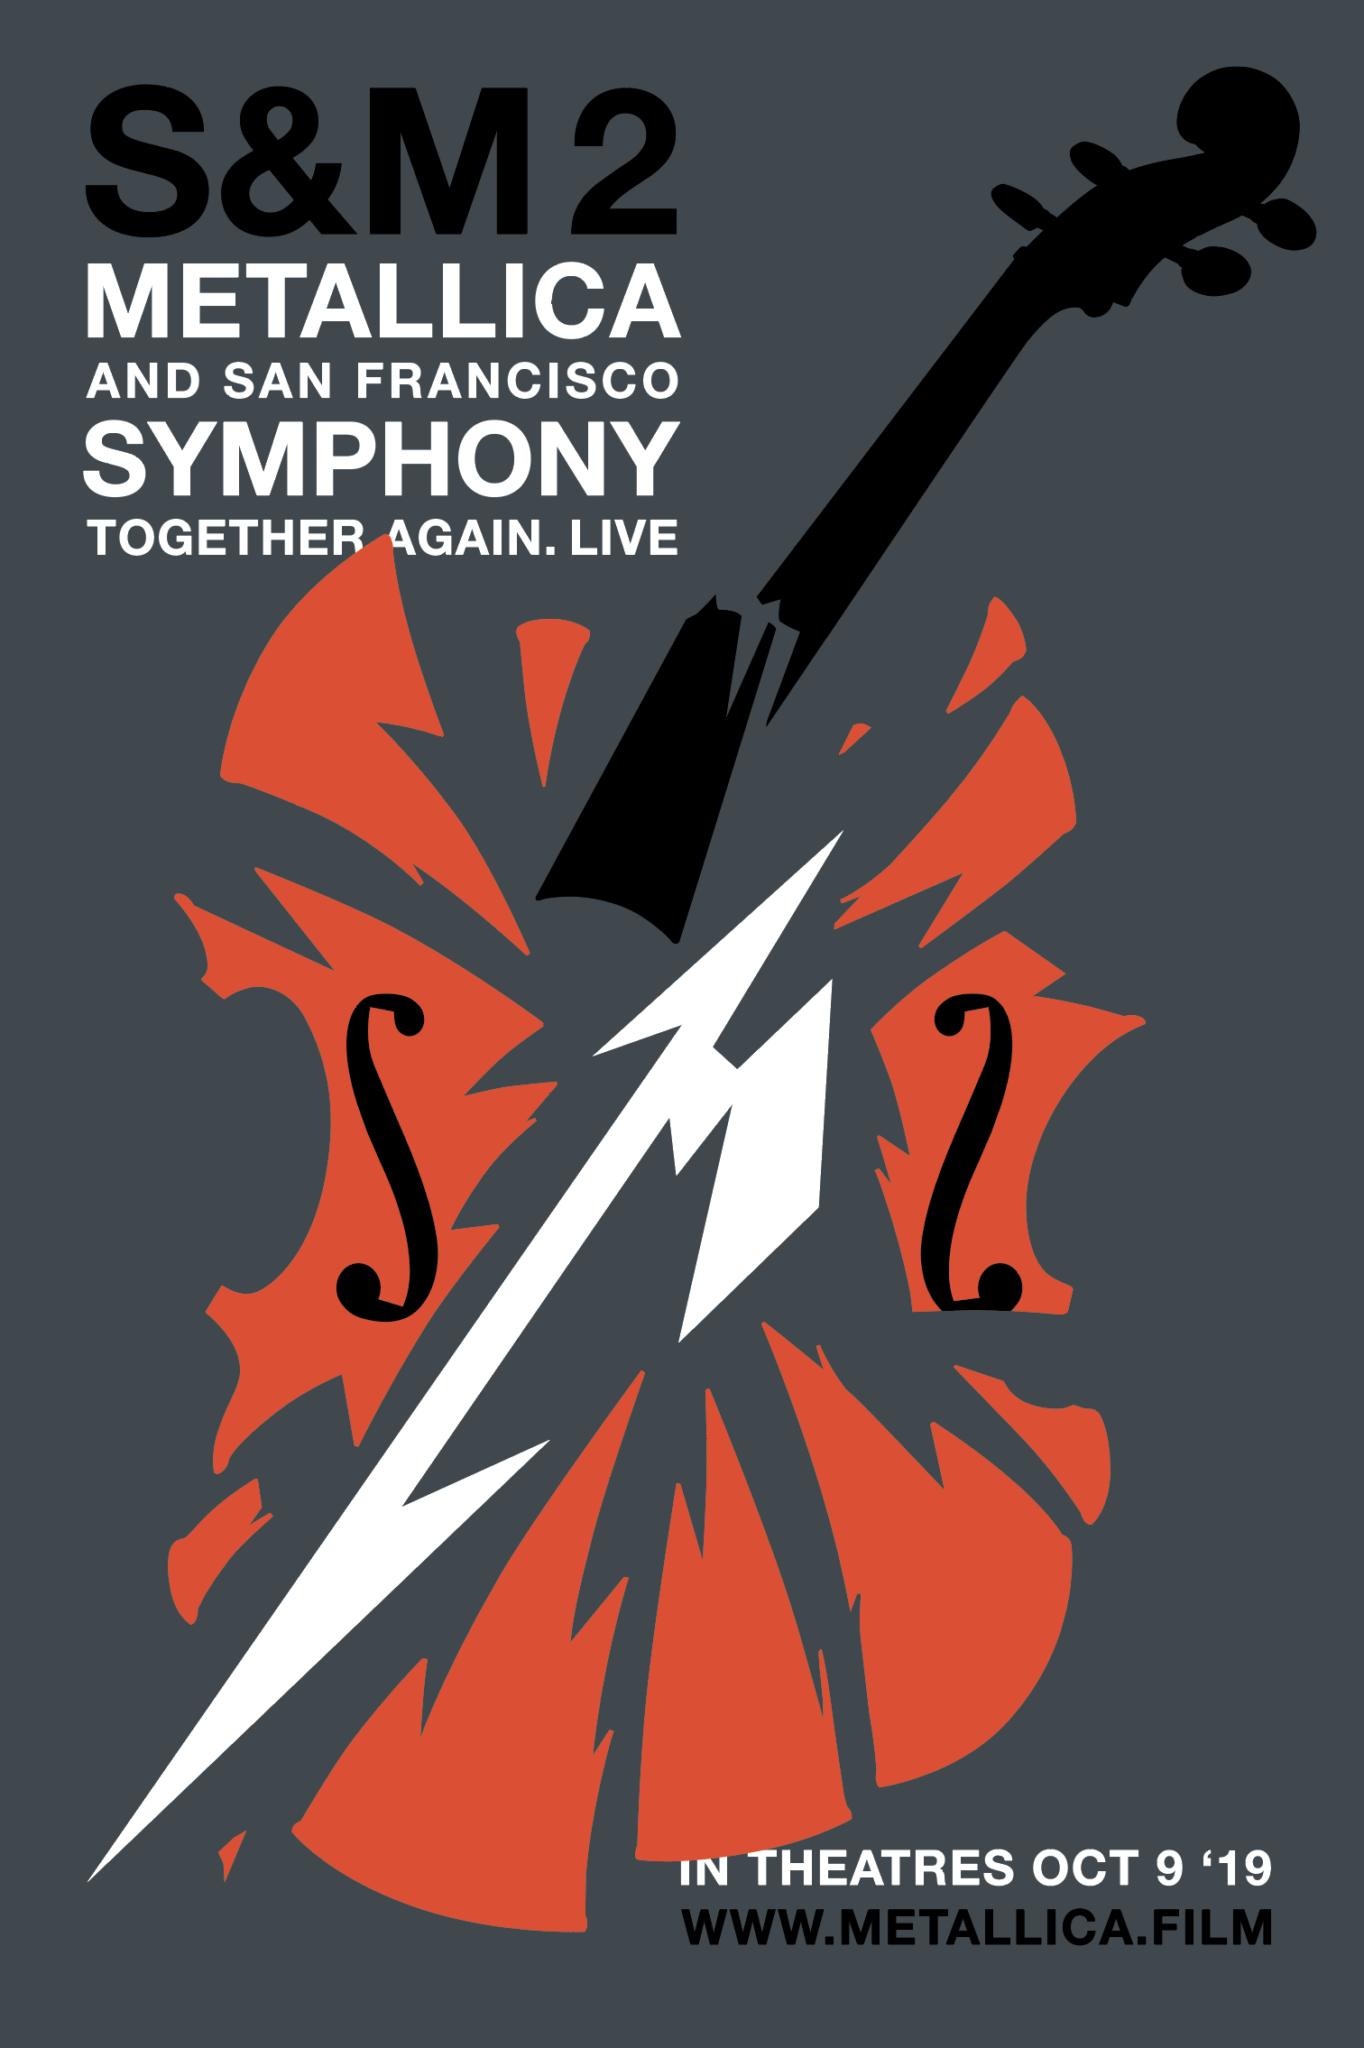 AFICINE LIVE MUSIC!<br>Metallica & San Francisco Symphony: S&M2